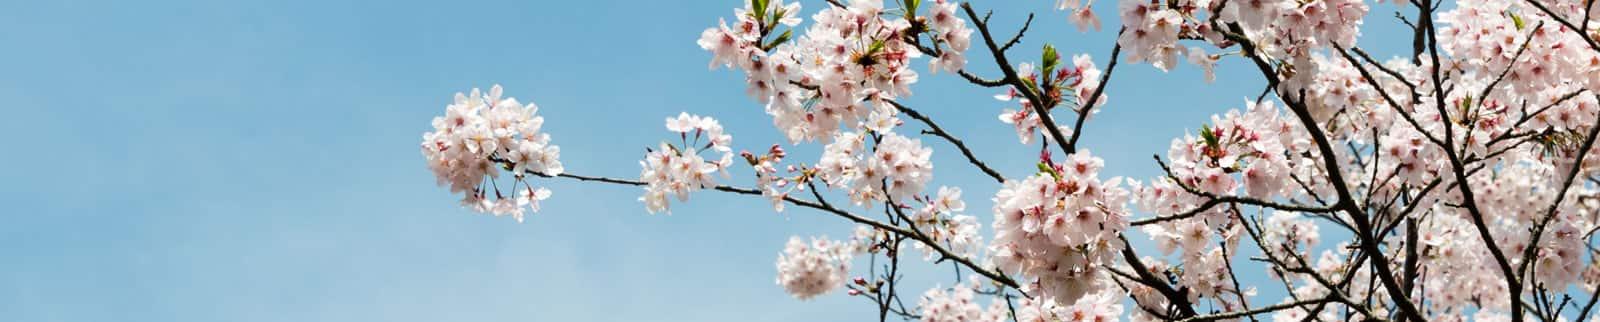 Cherry Blossom asiatique datant